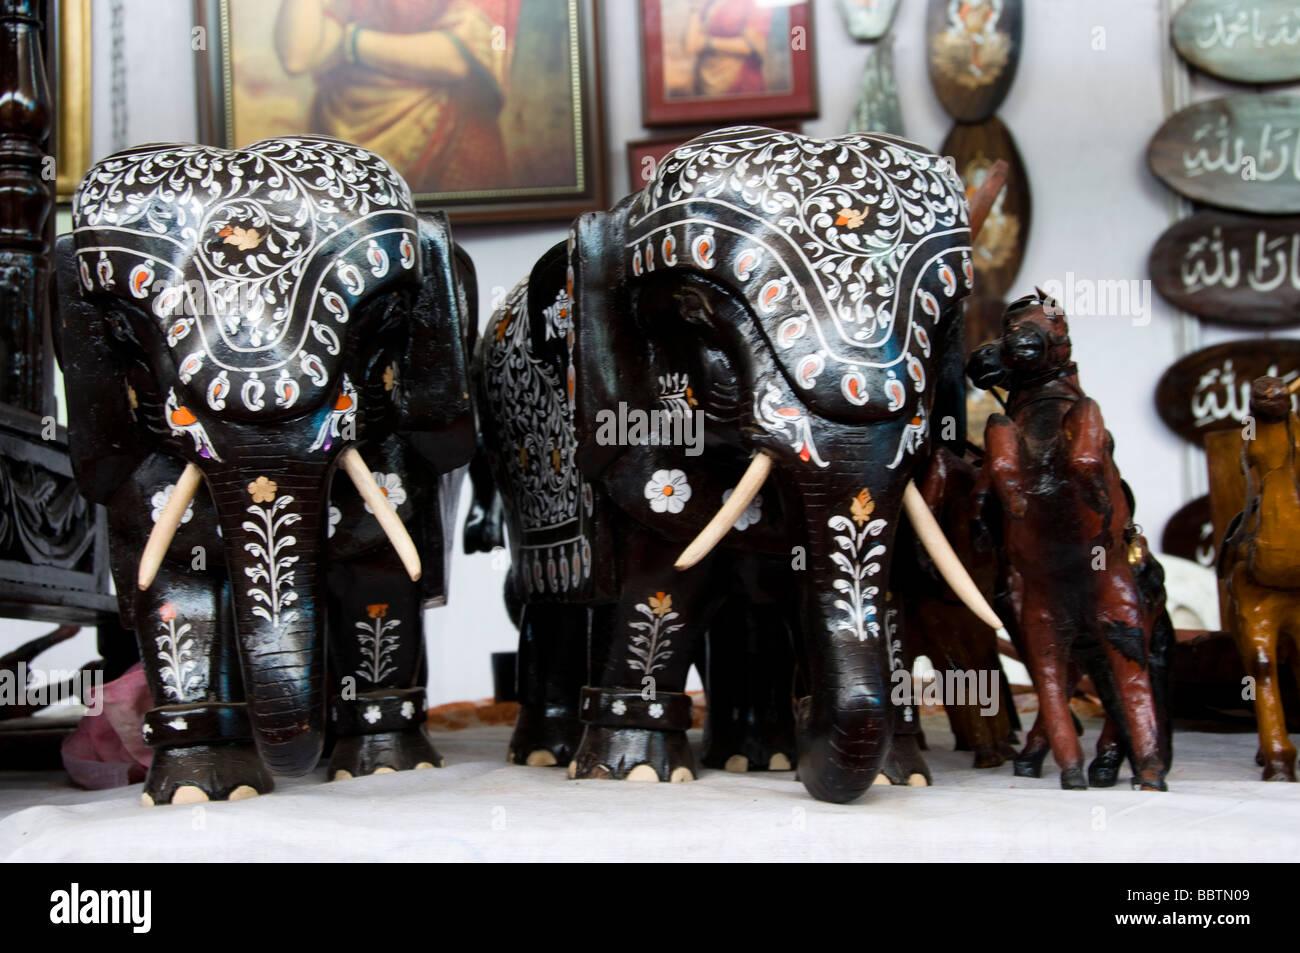 Decorated handmade elephant on sale - Stock Image